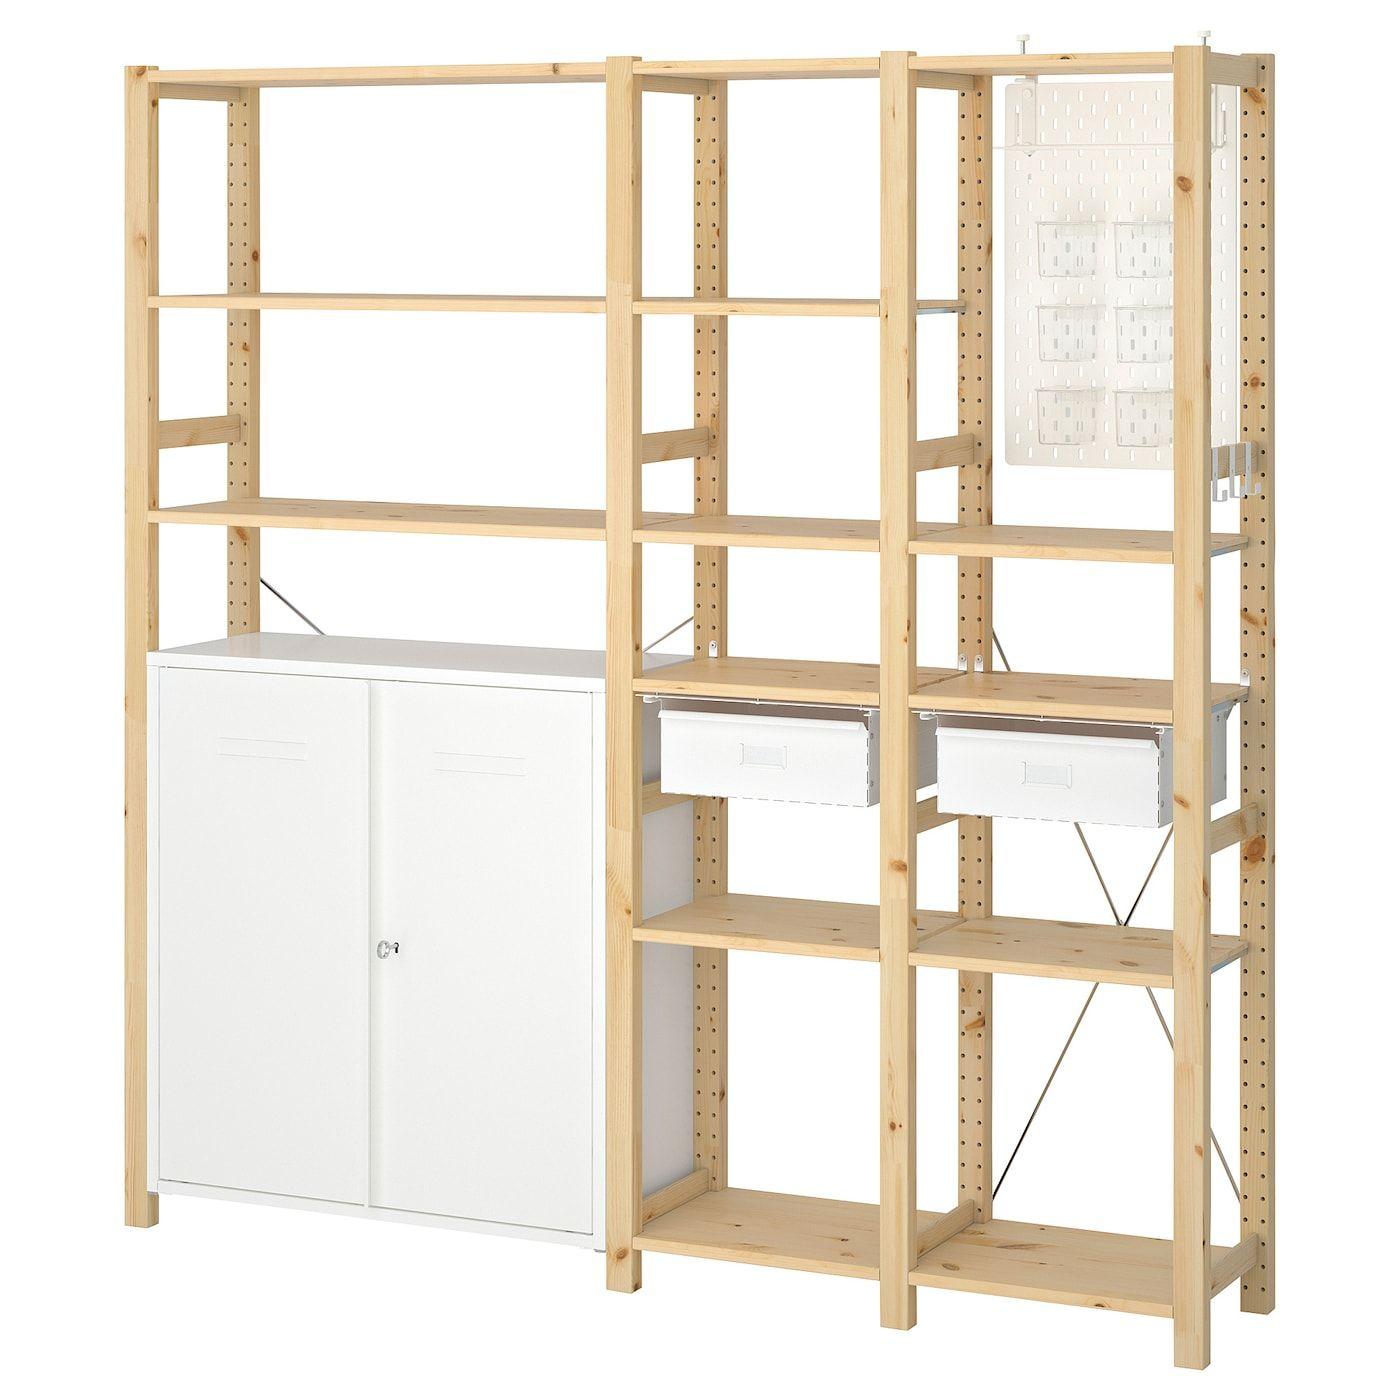 Ikea Ivar 3 Sections Cabinet Shelves In 2020 Shelves Small Shelving Unit Best Ikea